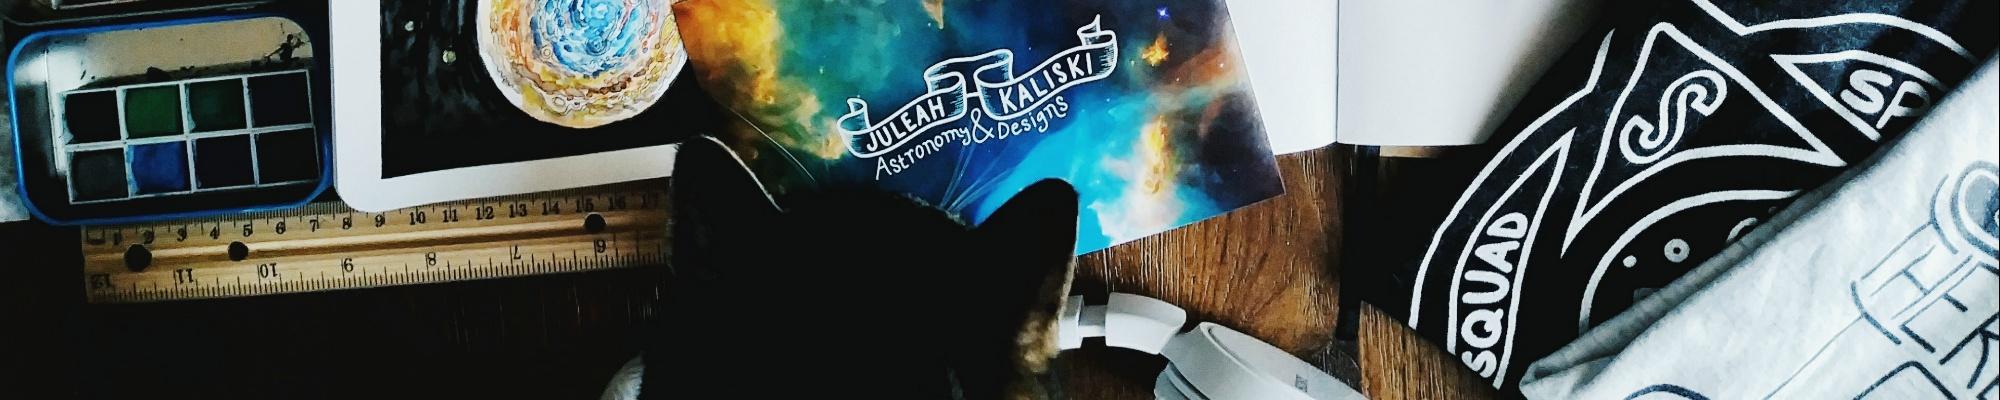 juleahkaliski Cover